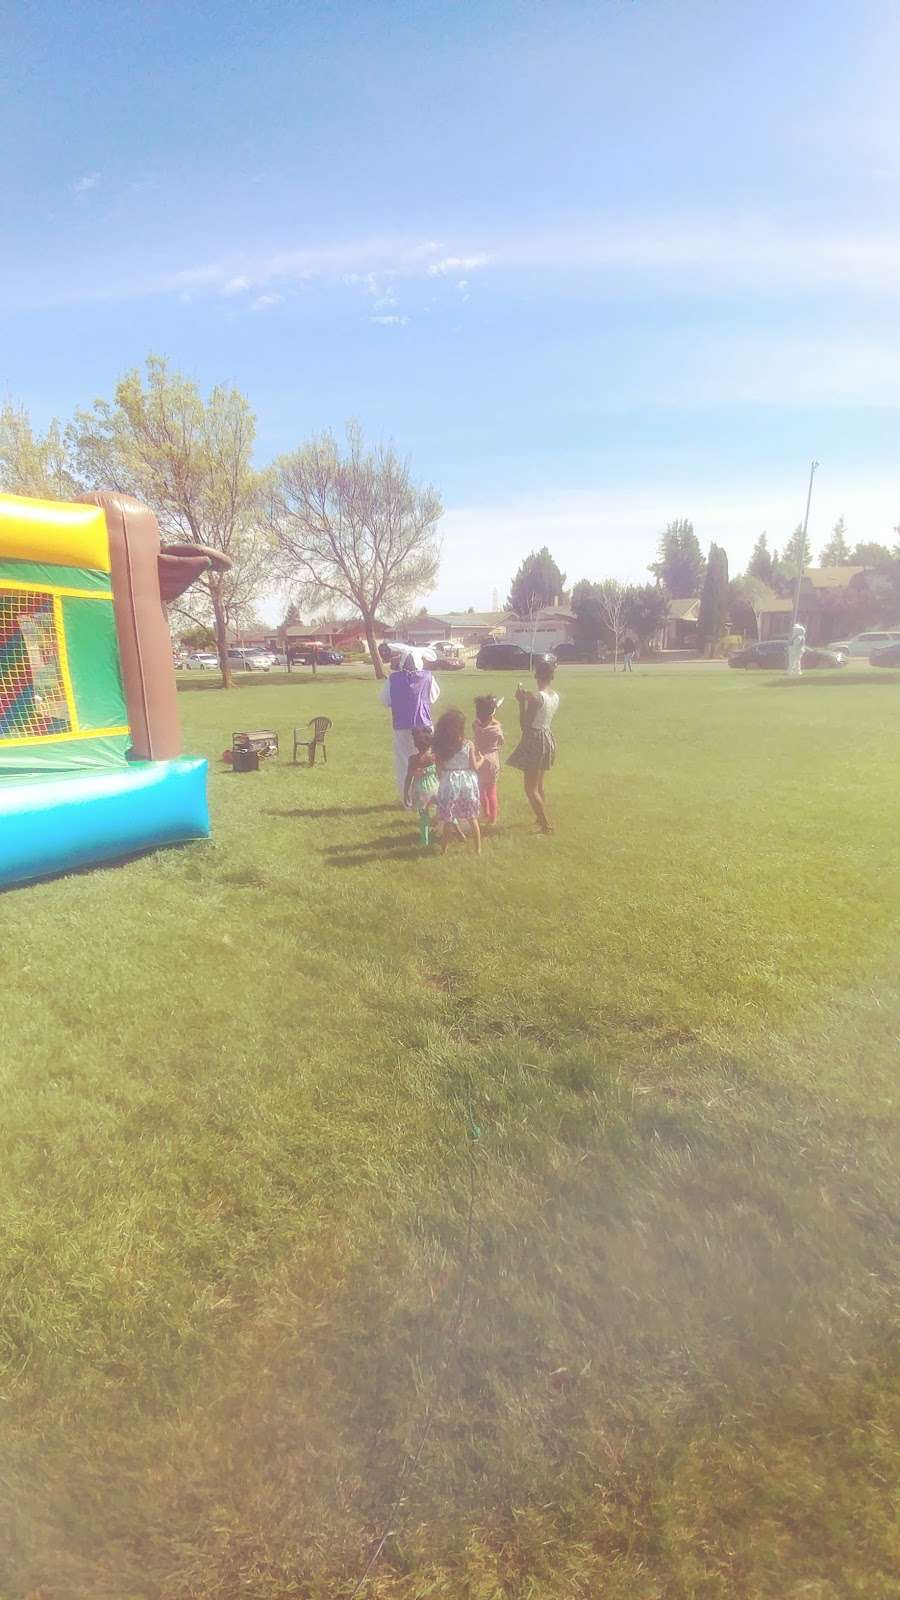 Ridgeview Park - park  | Photo 10 of 10 | Address: 4966 Silver Creek Rd, Fairfield, CA 94534, USA | Phone: (707) 428-7431